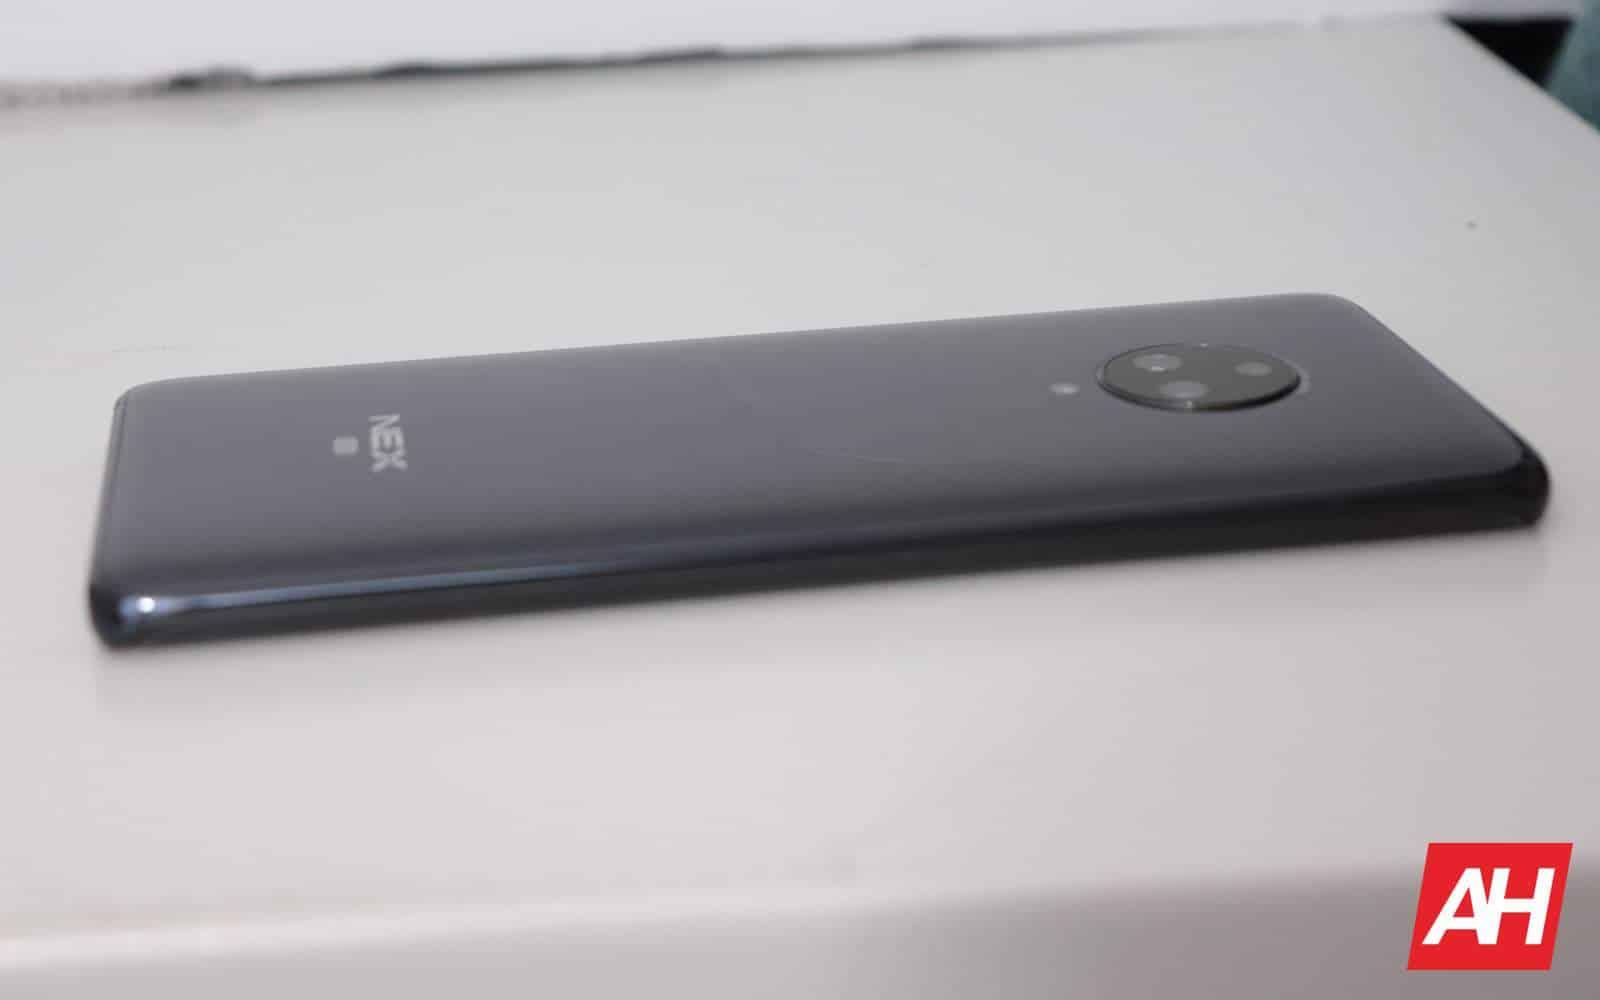 02 5 Vivo NEX 3 5G Review Hardware AH 2019